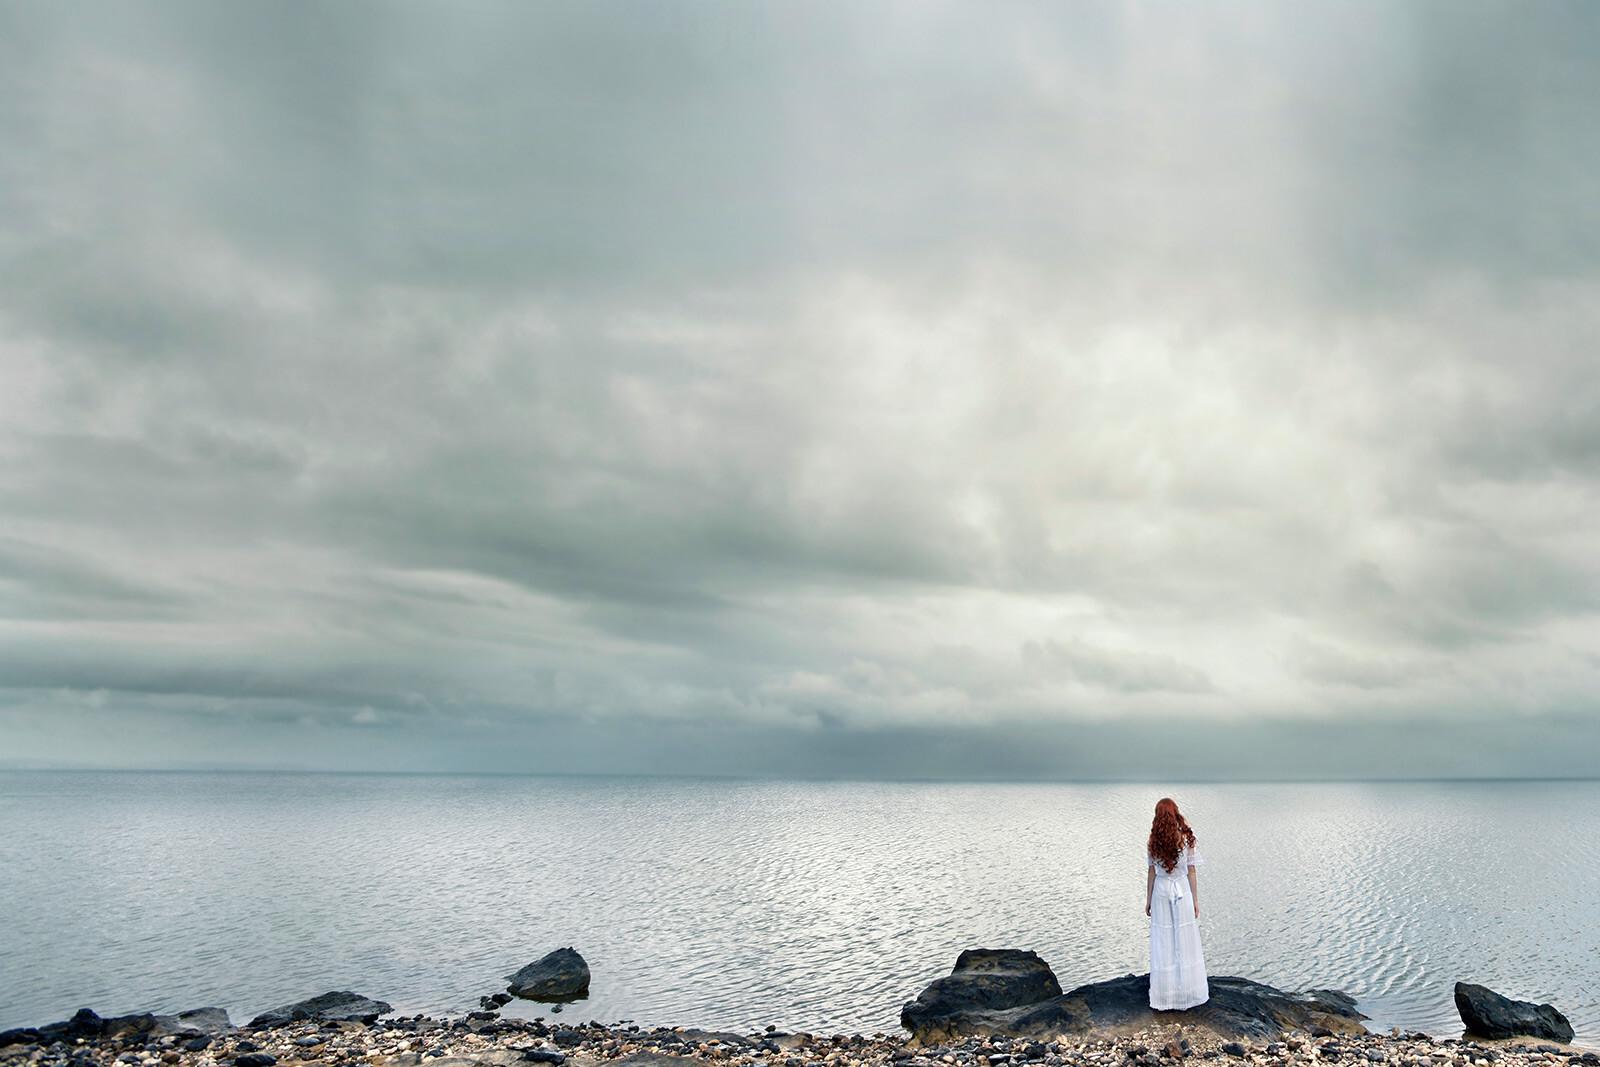 Silence - Aida Pascual Benito